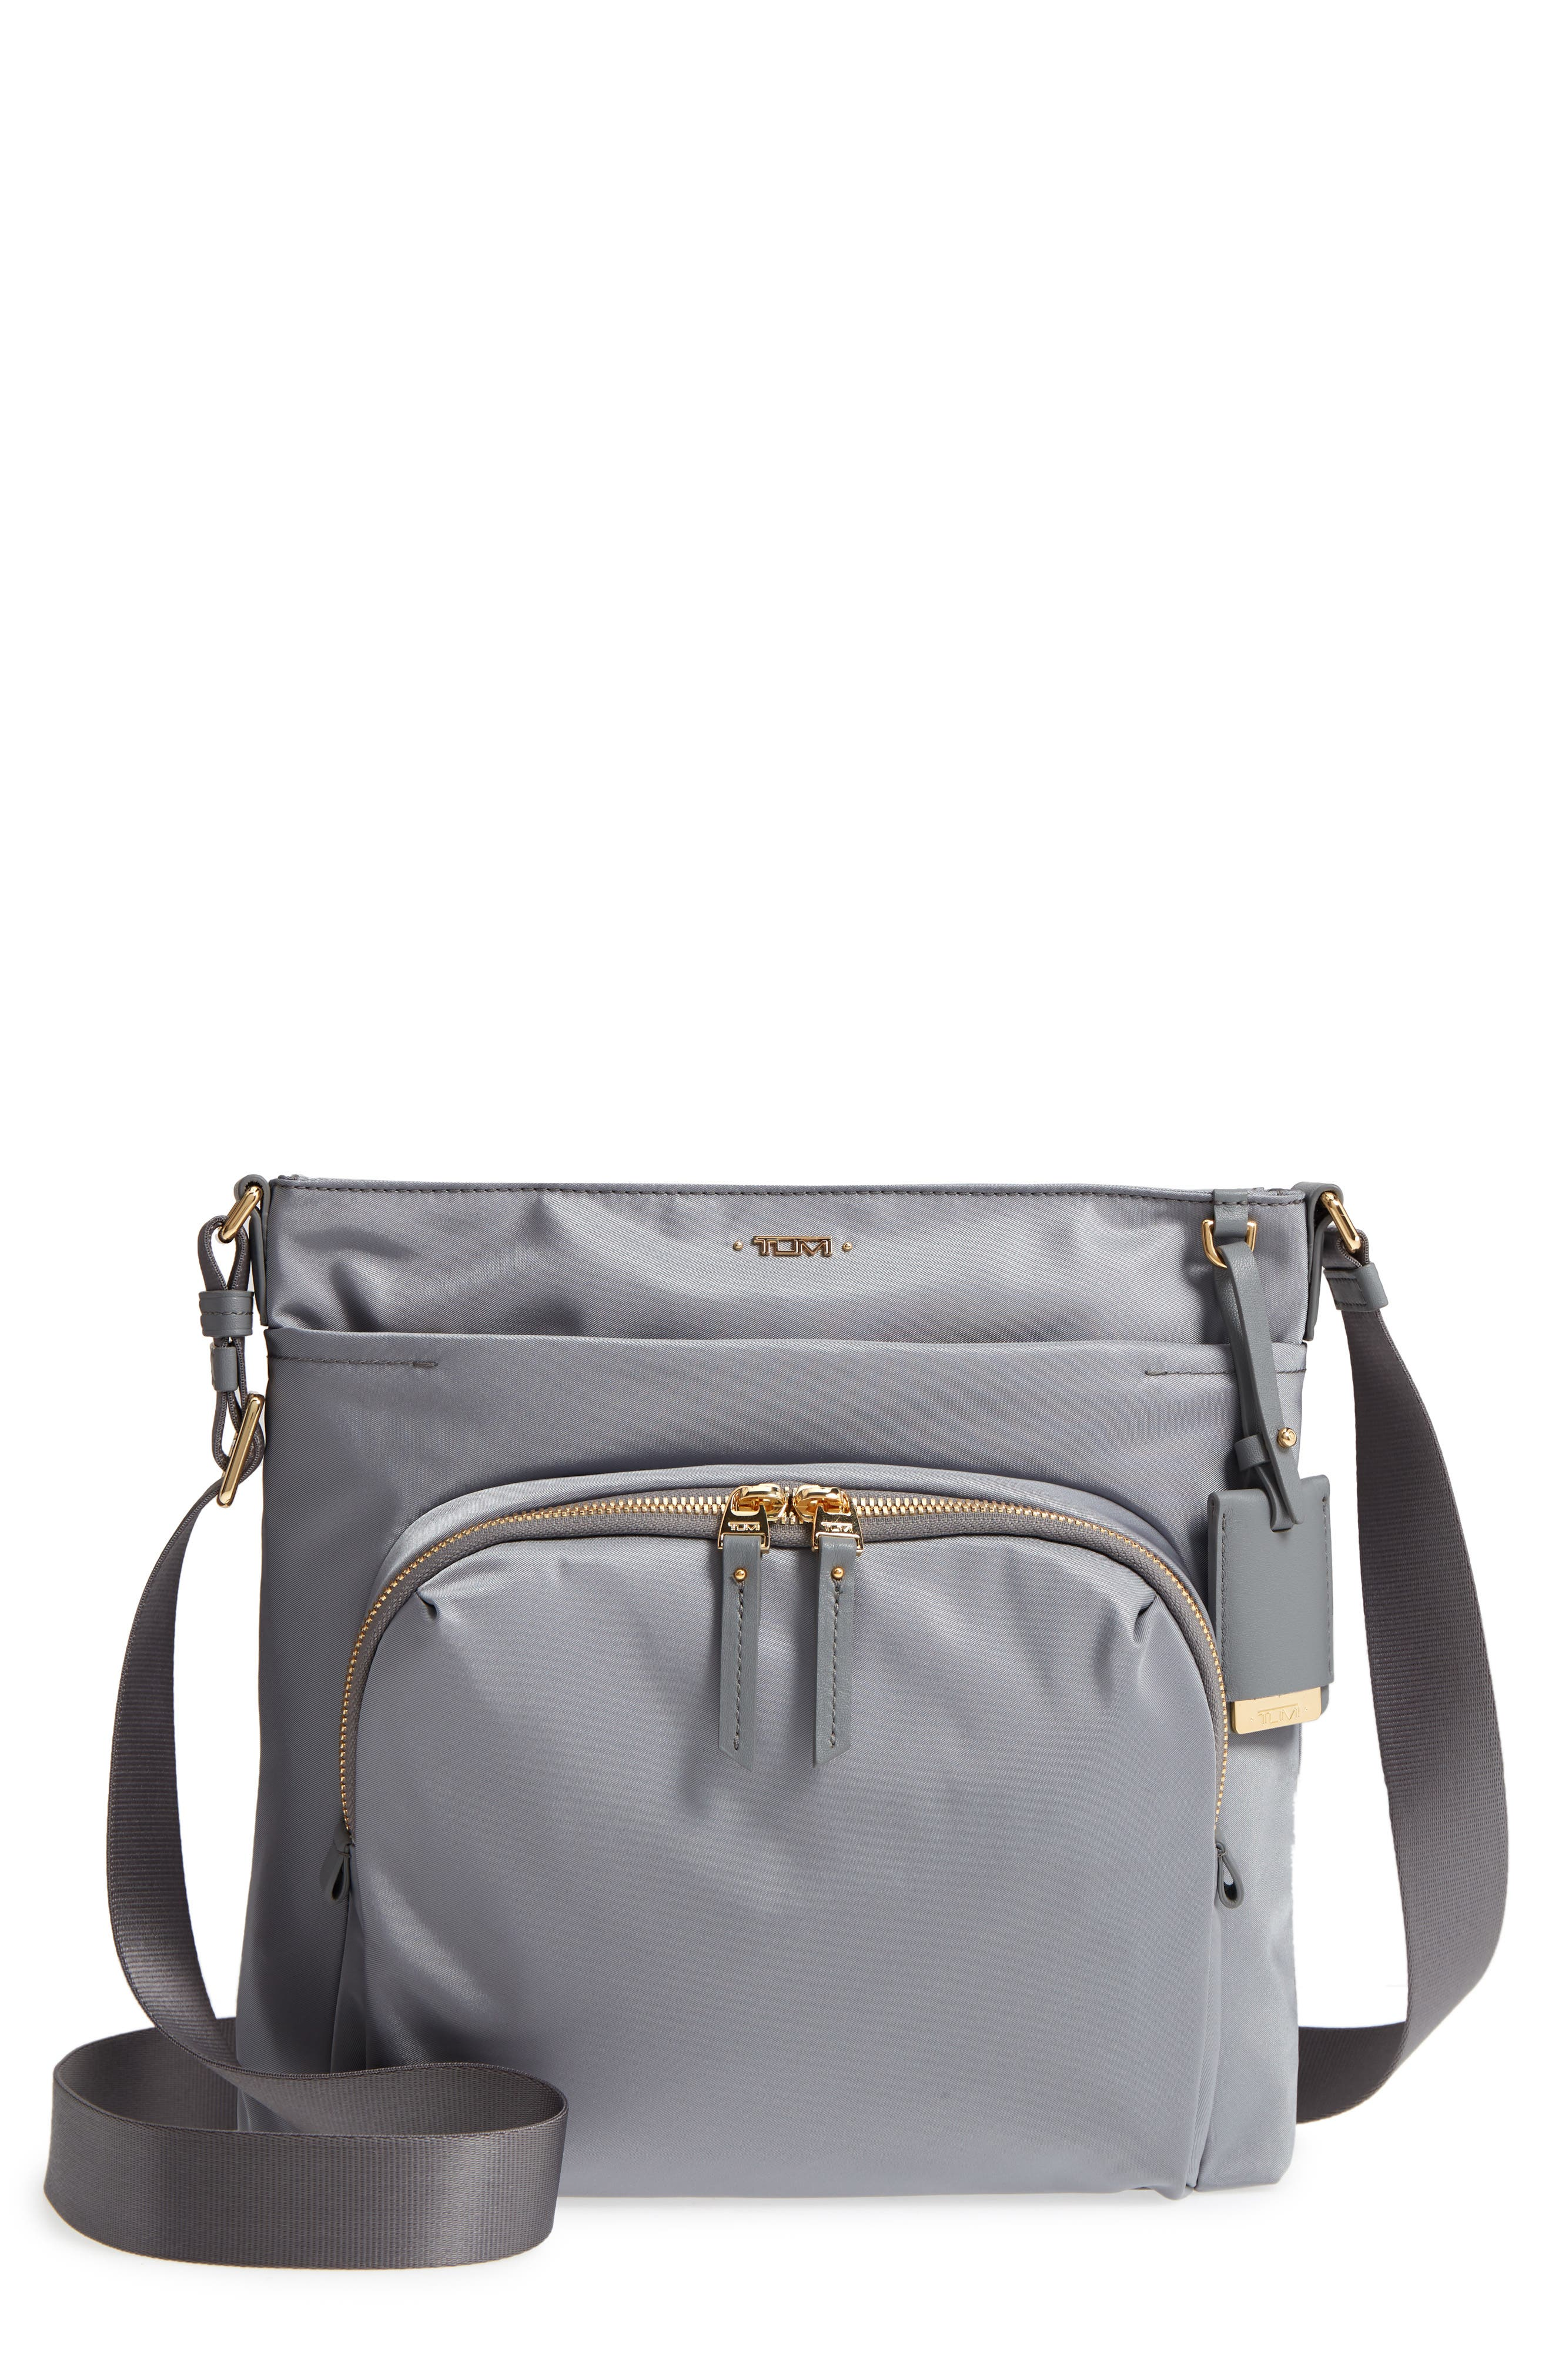 Voyager - Capri Nylon Crossbody Bag,                             Main thumbnail 1, color,                             Grey